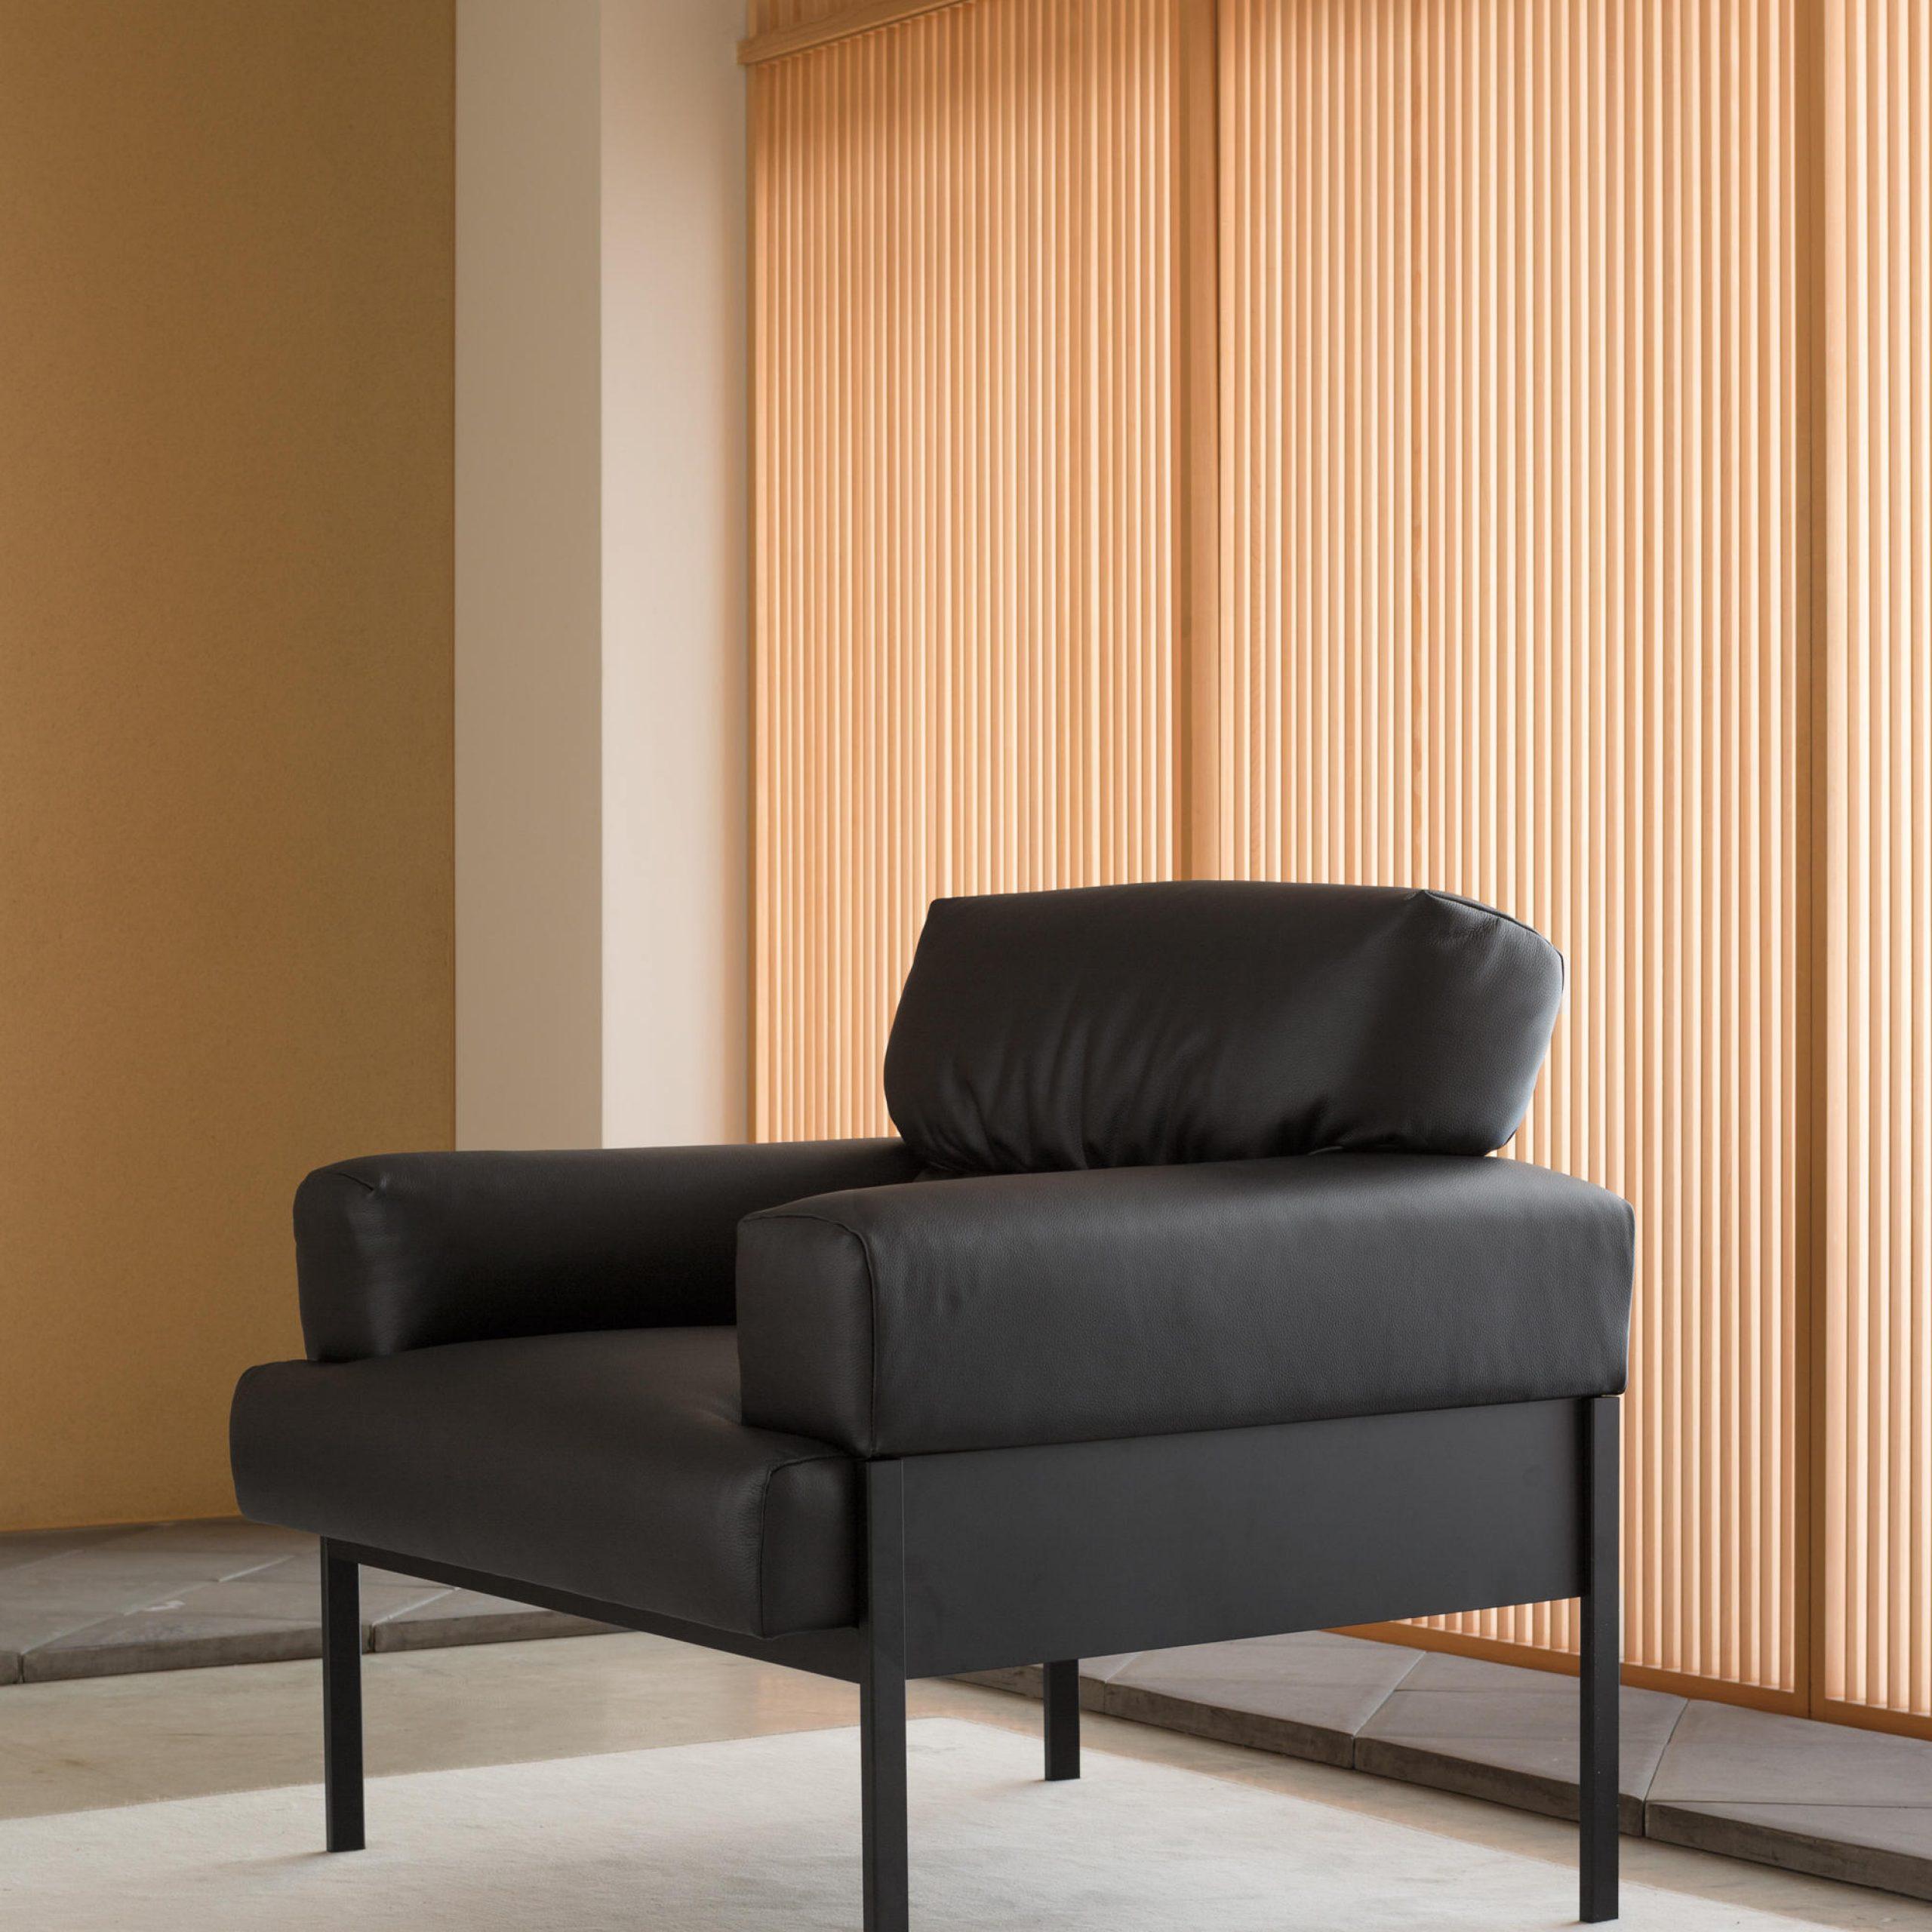 Suki | Armchair & Designer Furniture | Architonic Within Suki Armchairs (View 3 of 15)